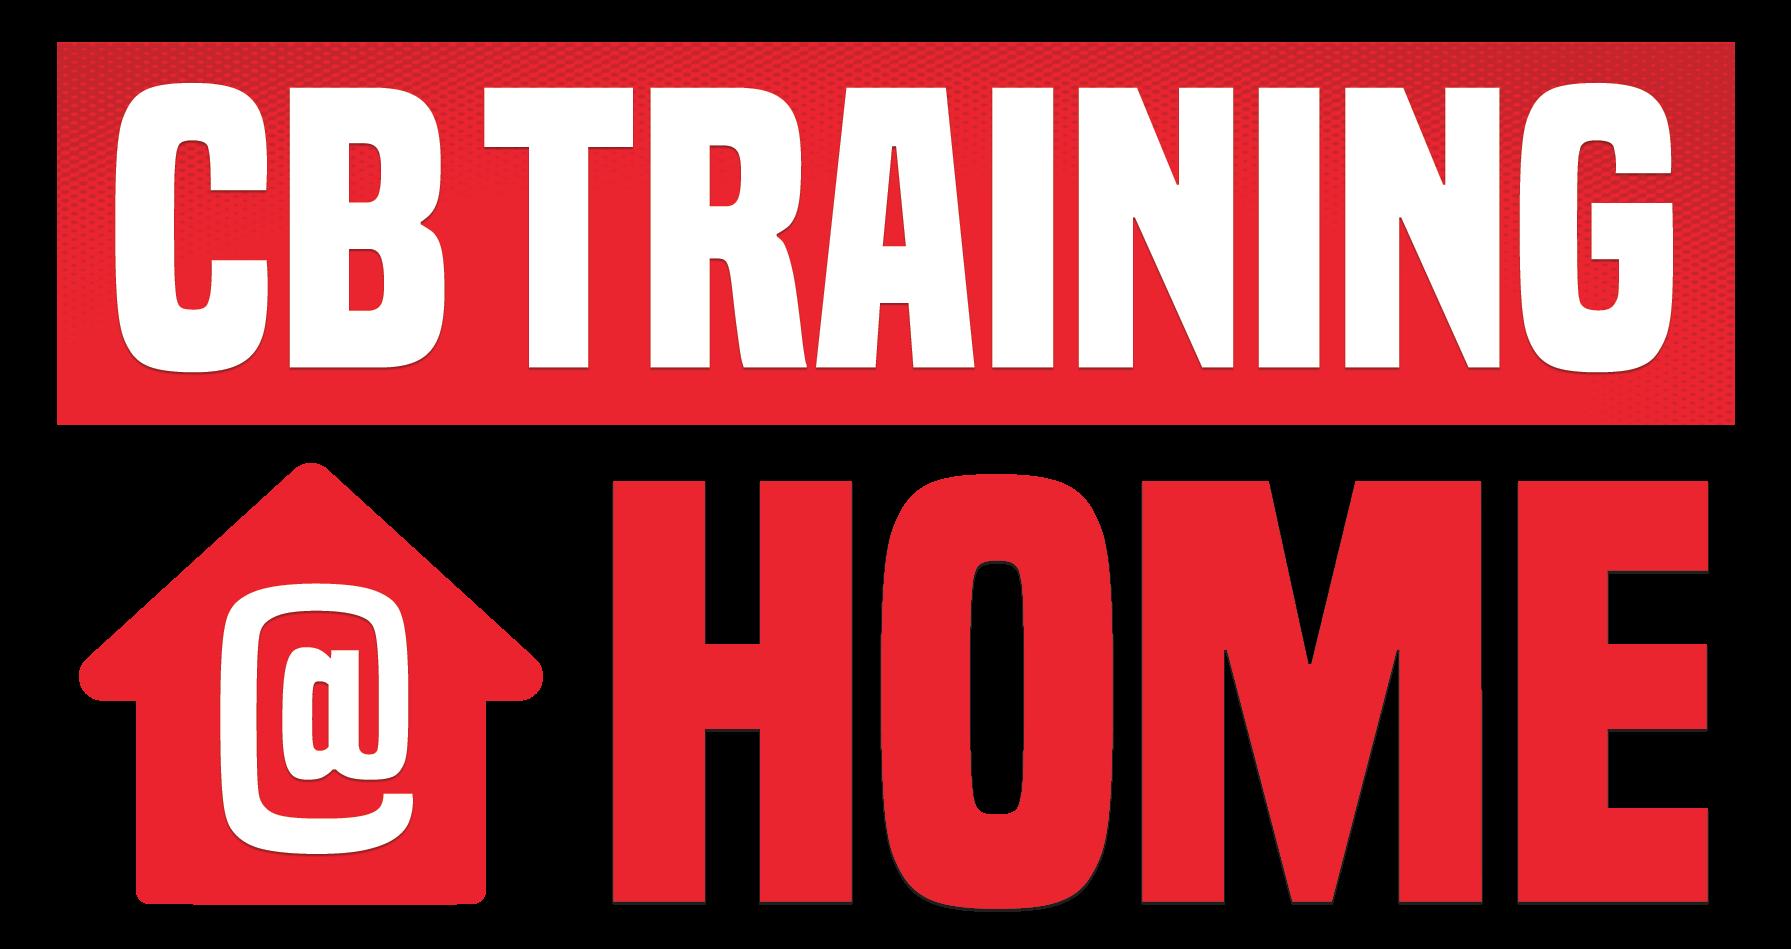 CB Training @ Home